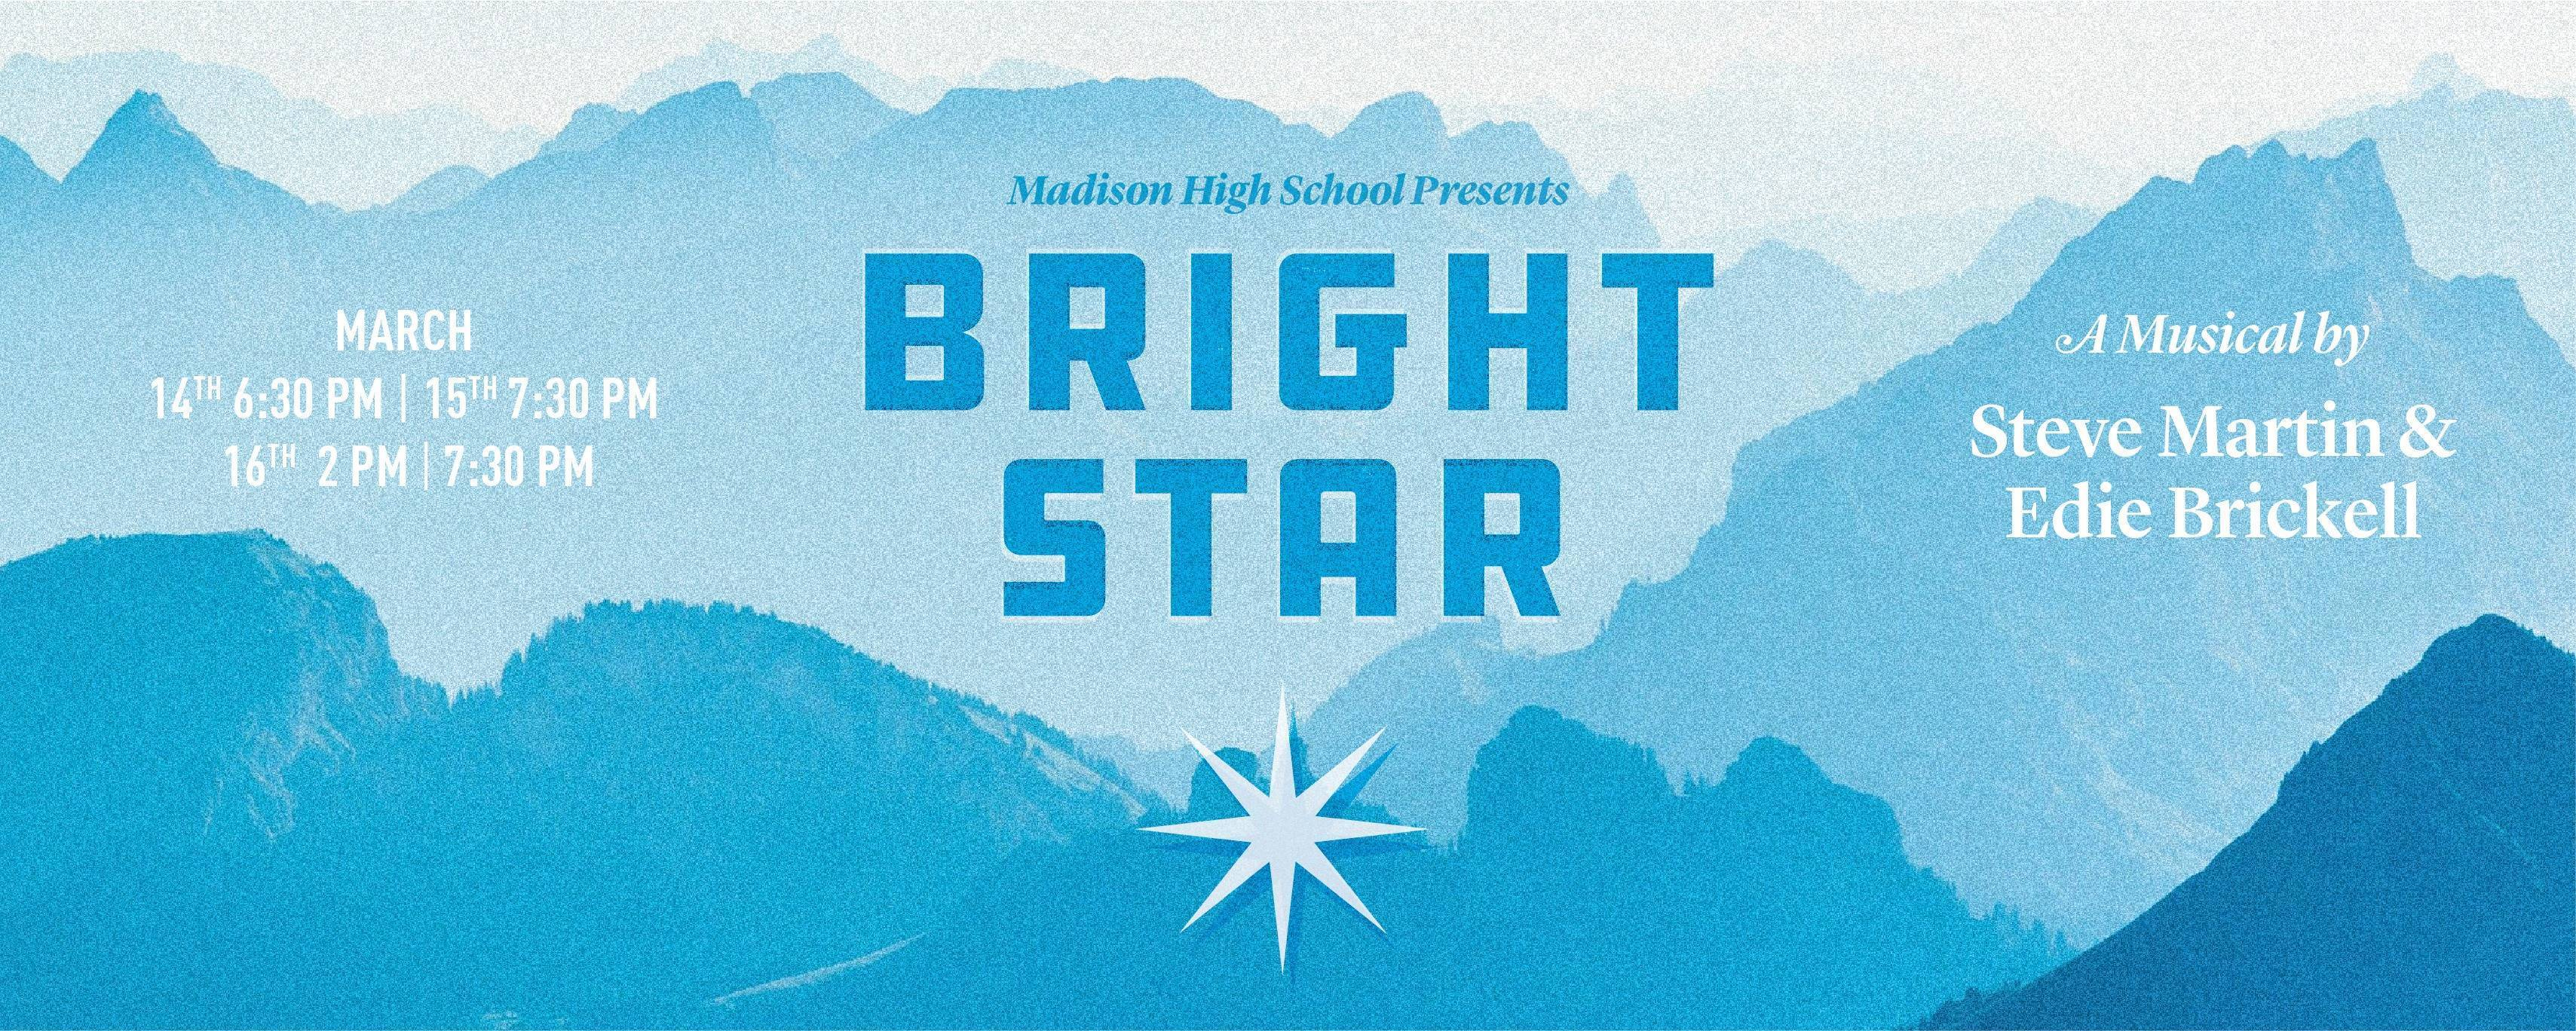 Bright Star Facebook Event Banner.jpg